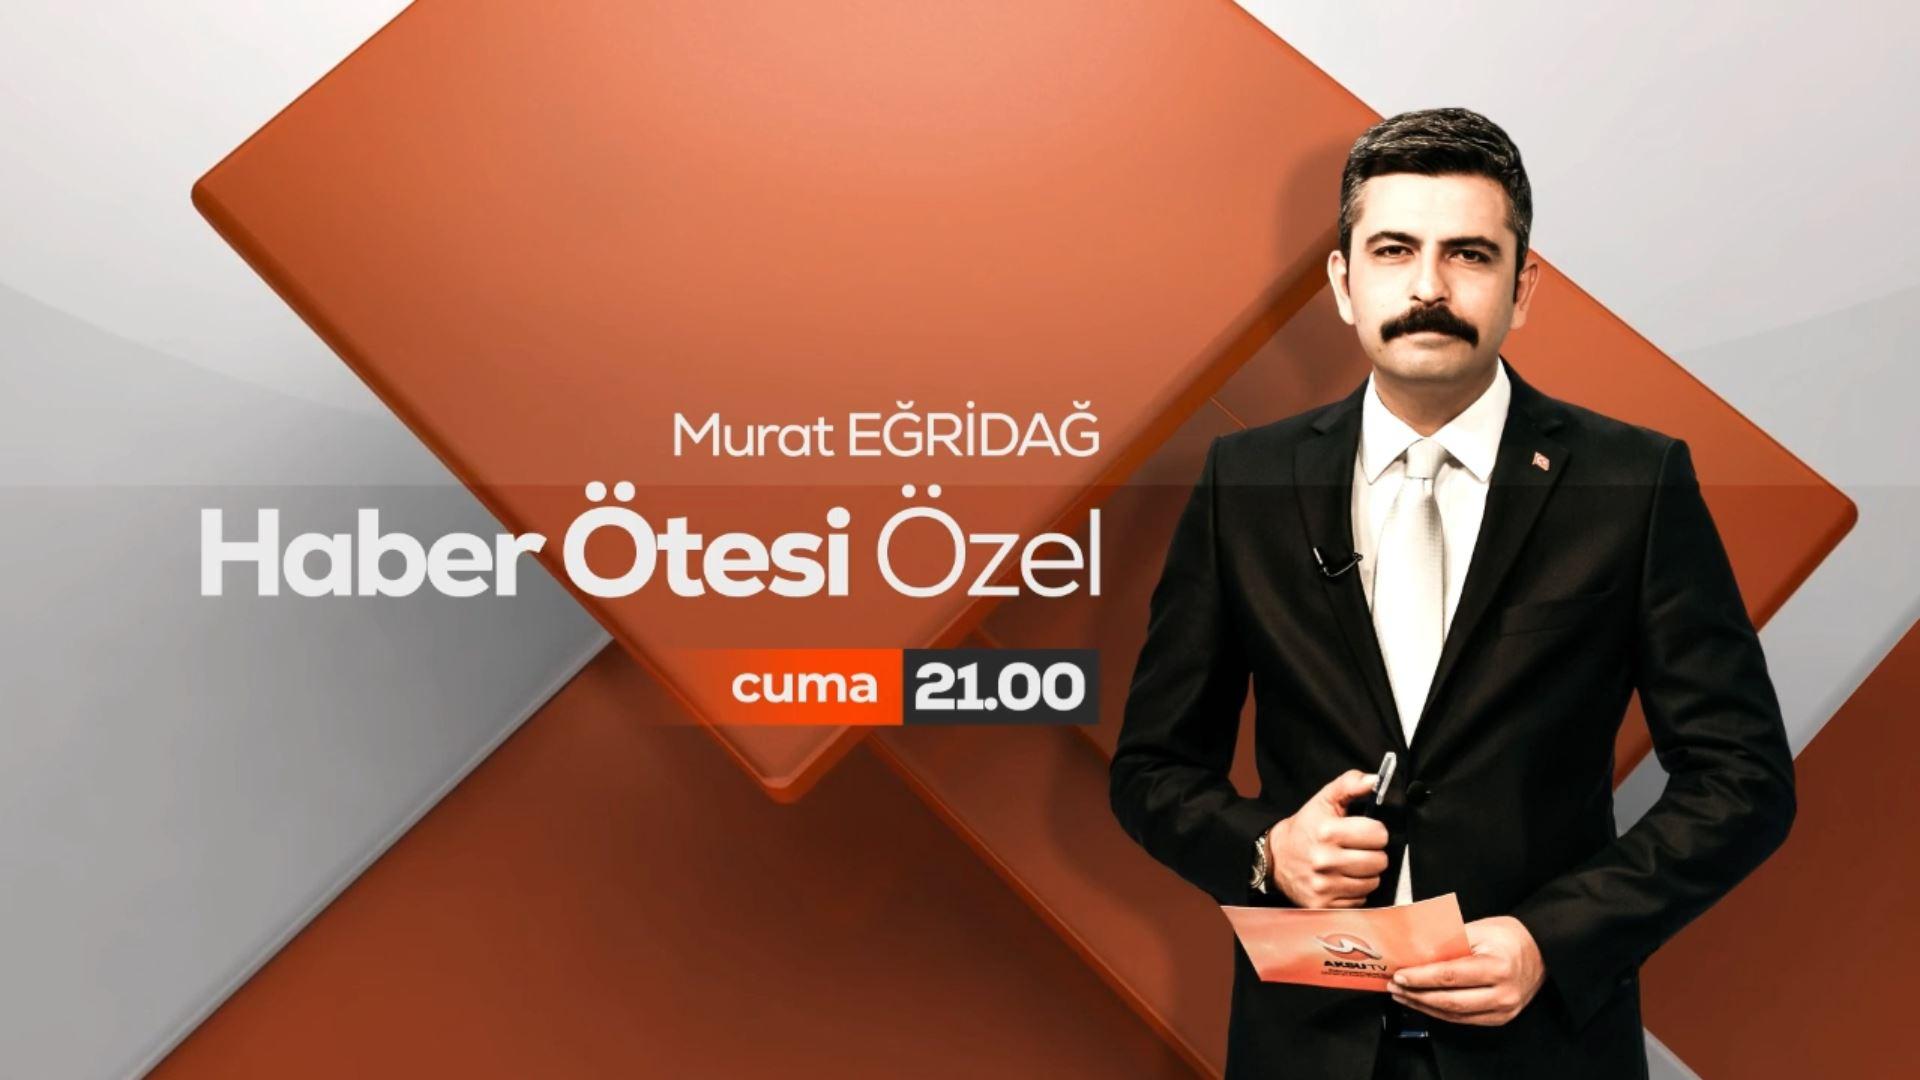 haber-otesi-ozel-18-haziran-2021-tanitim-2